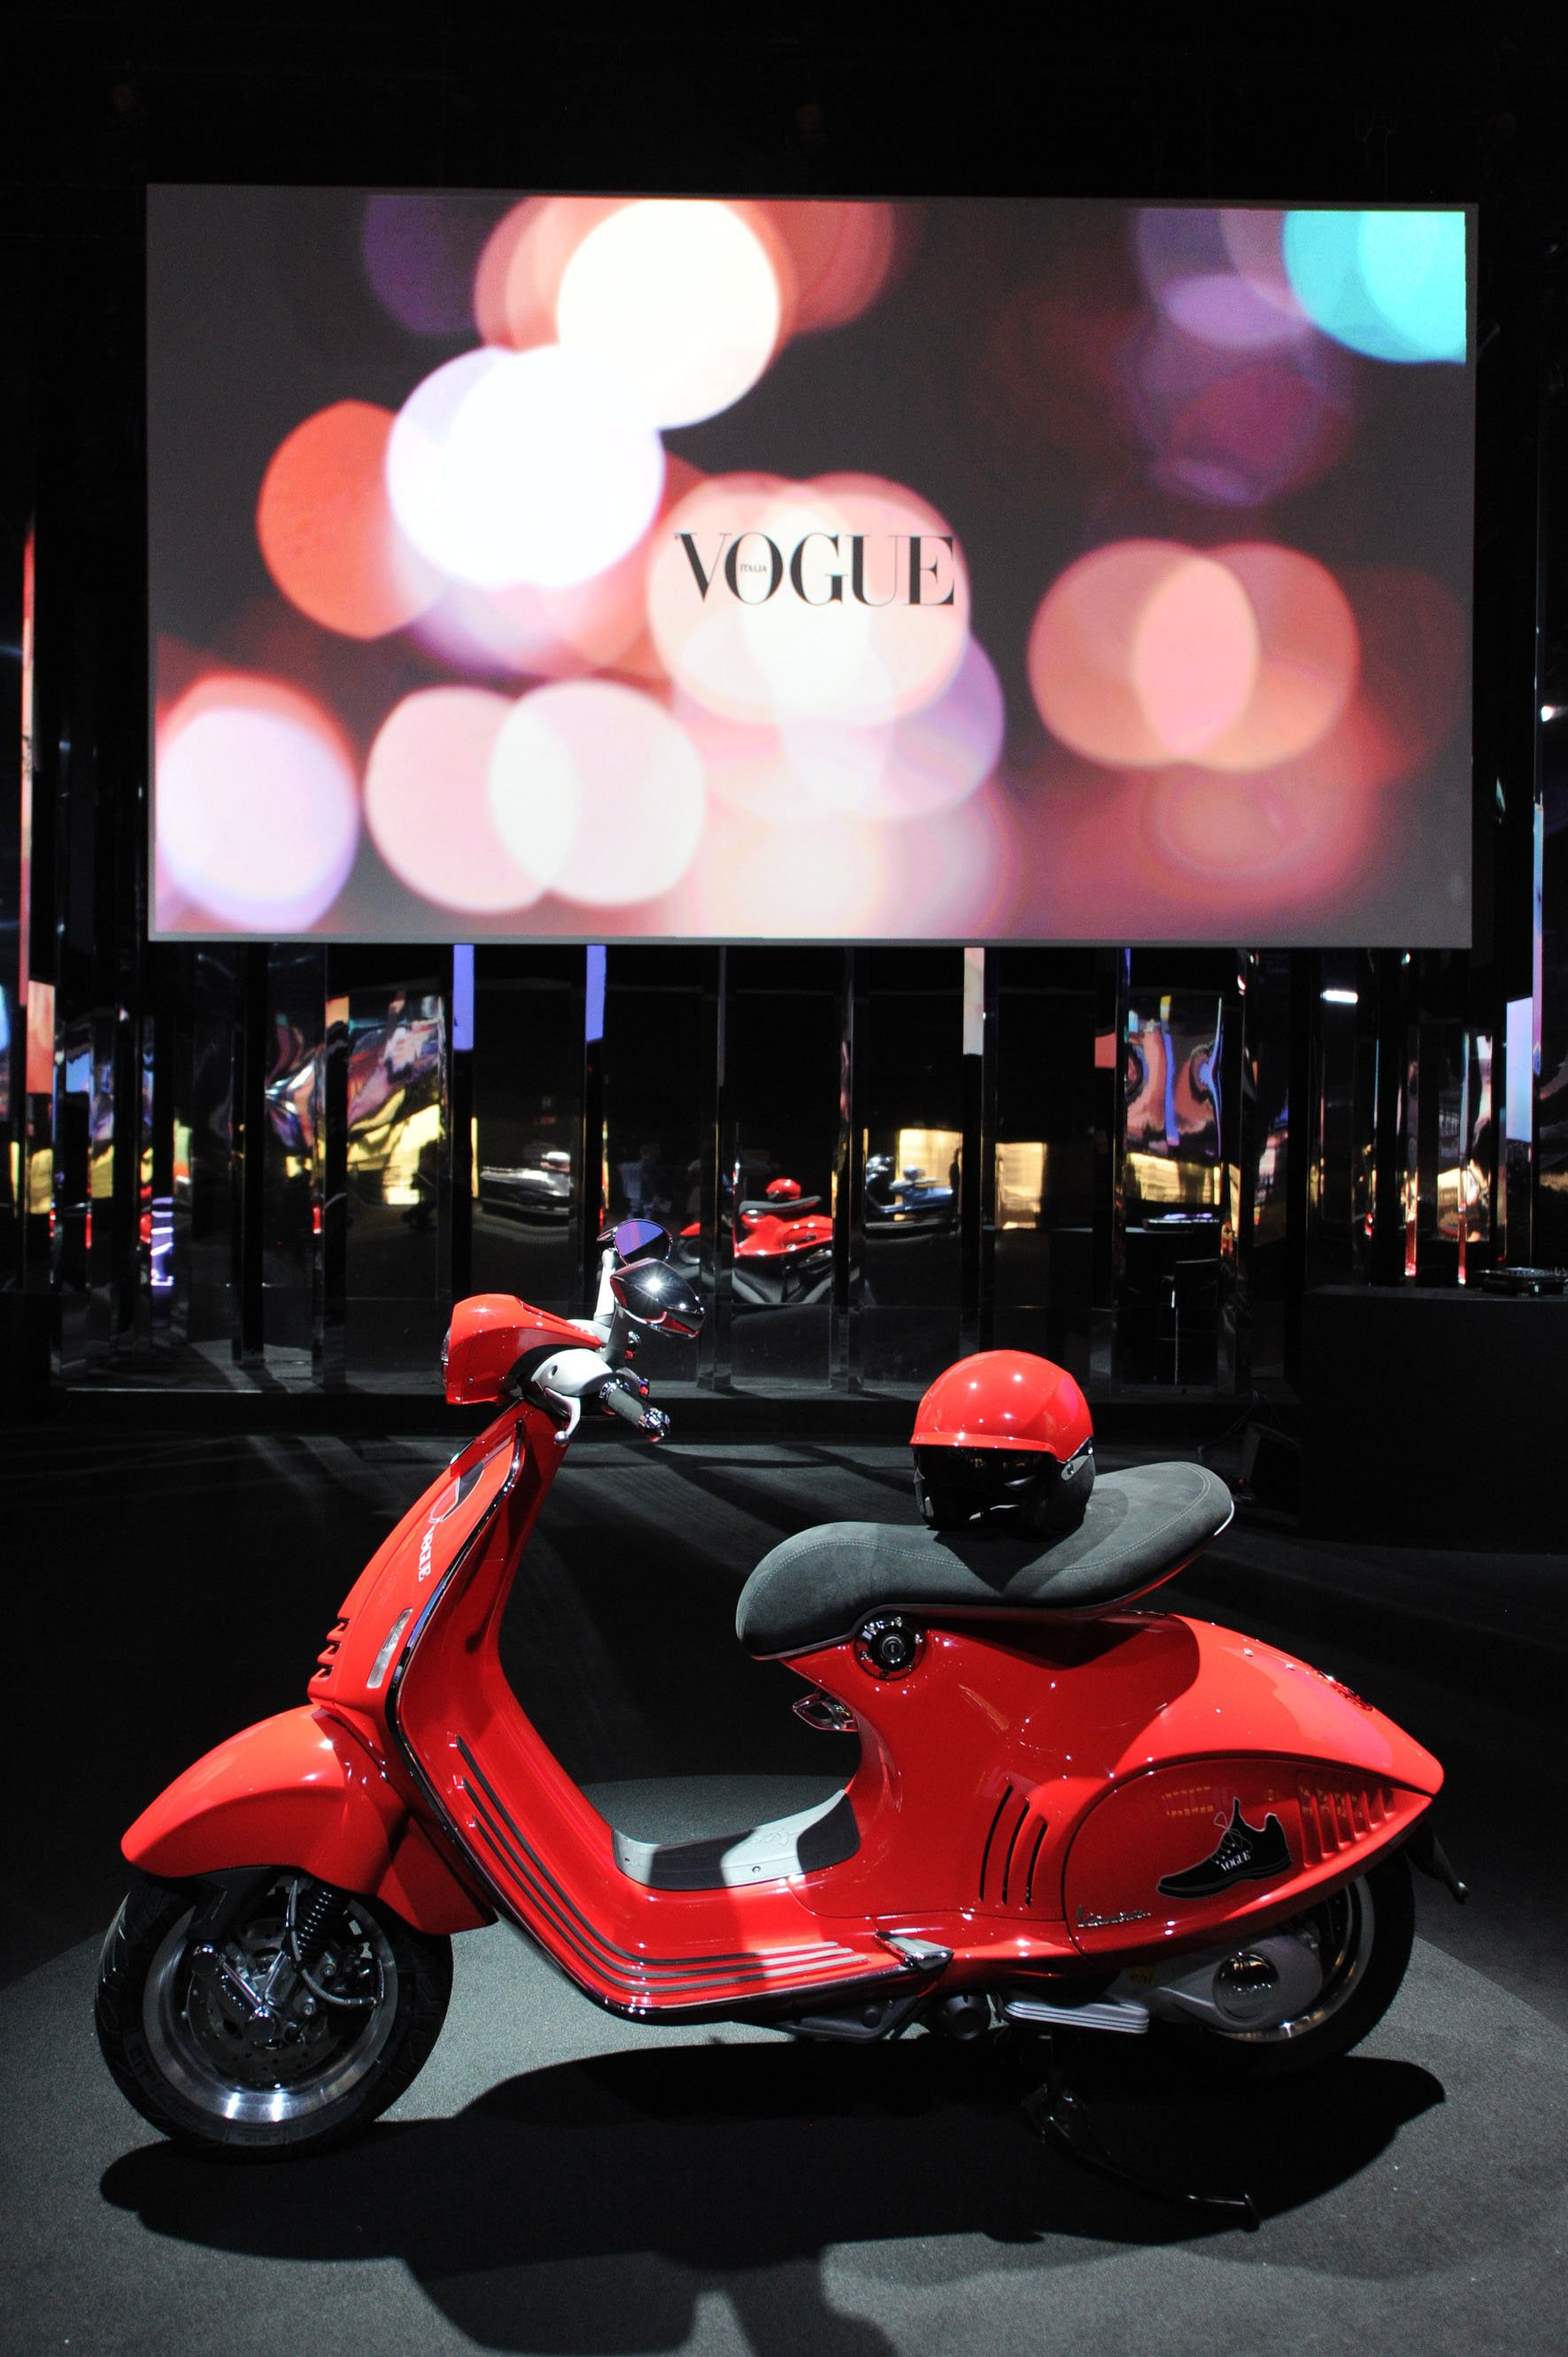 Vespa 946 Vogue 2.jpeg